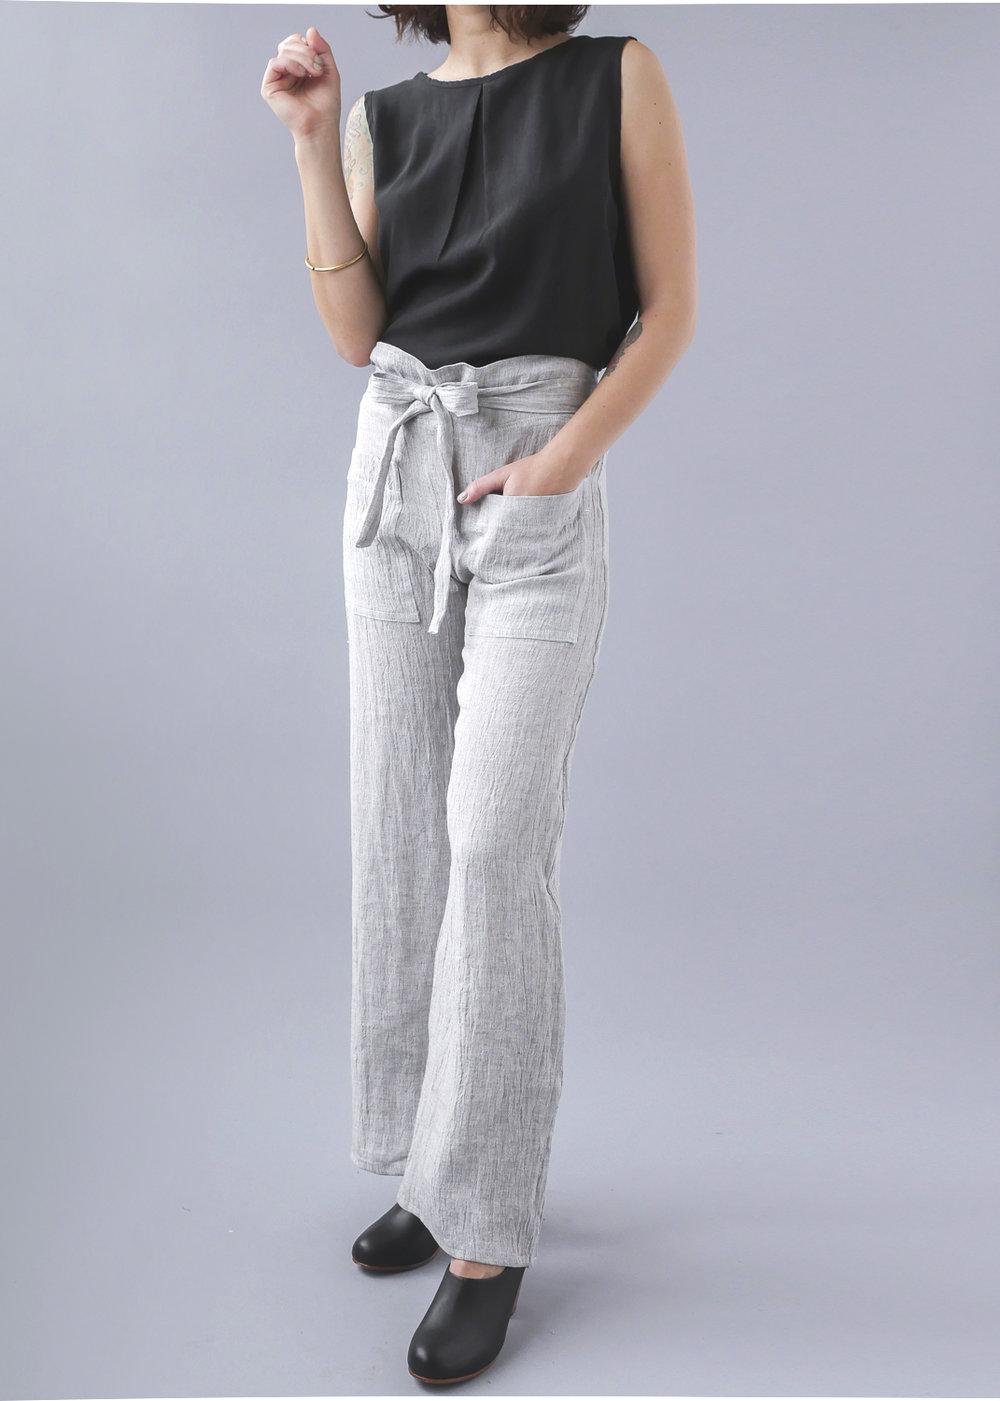 Temperate Jan light grey pants.jpg